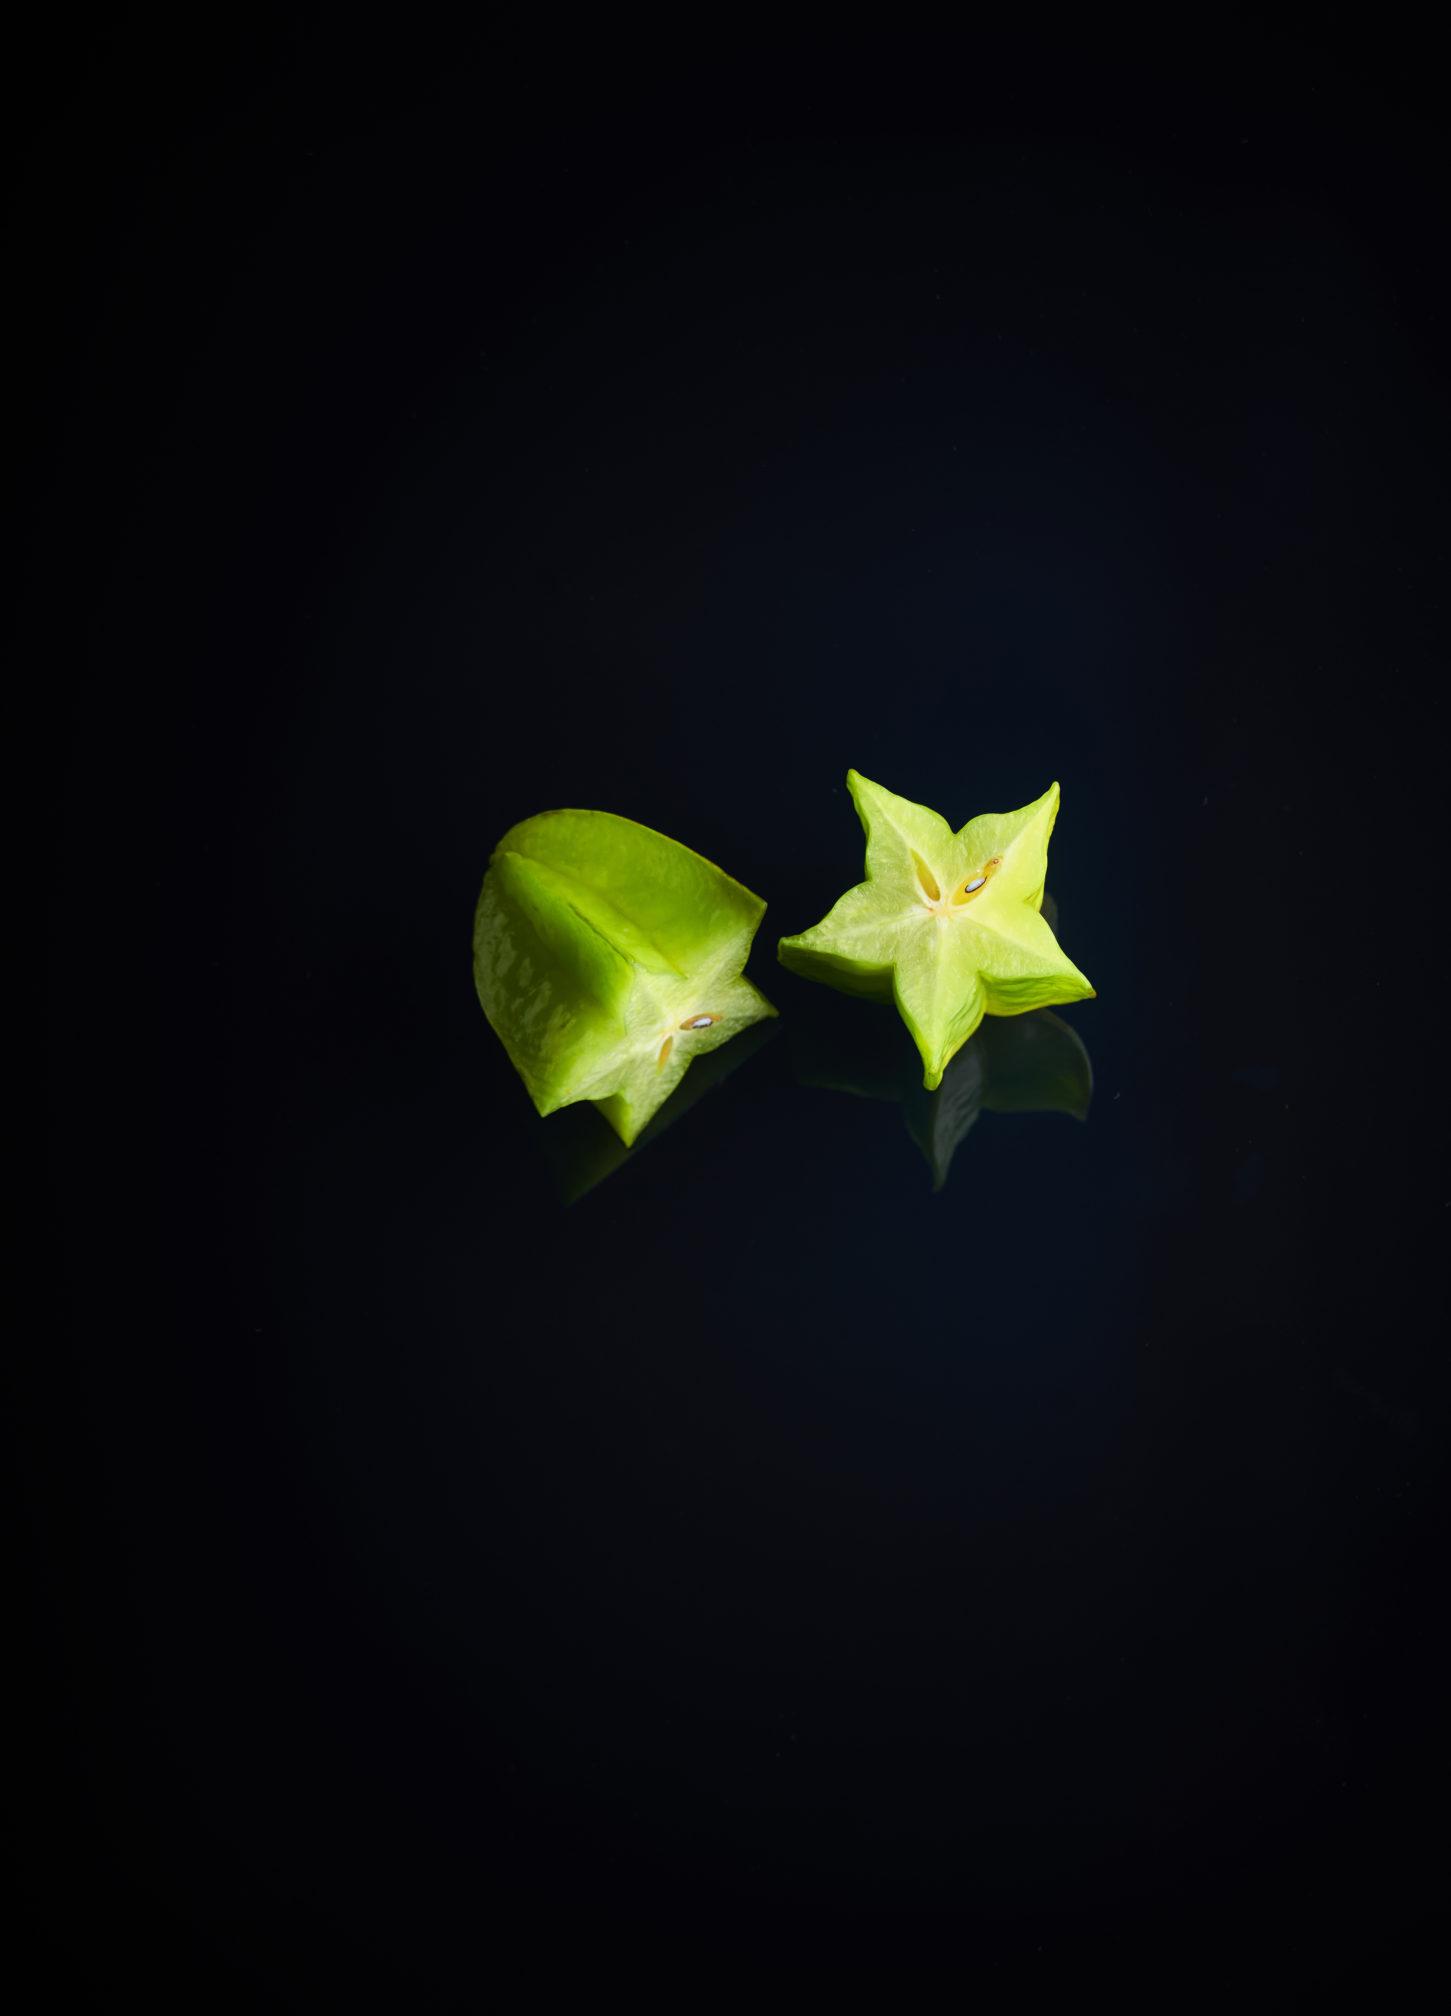 capexo-lilot-fruits-exotique-carambole-malaisie